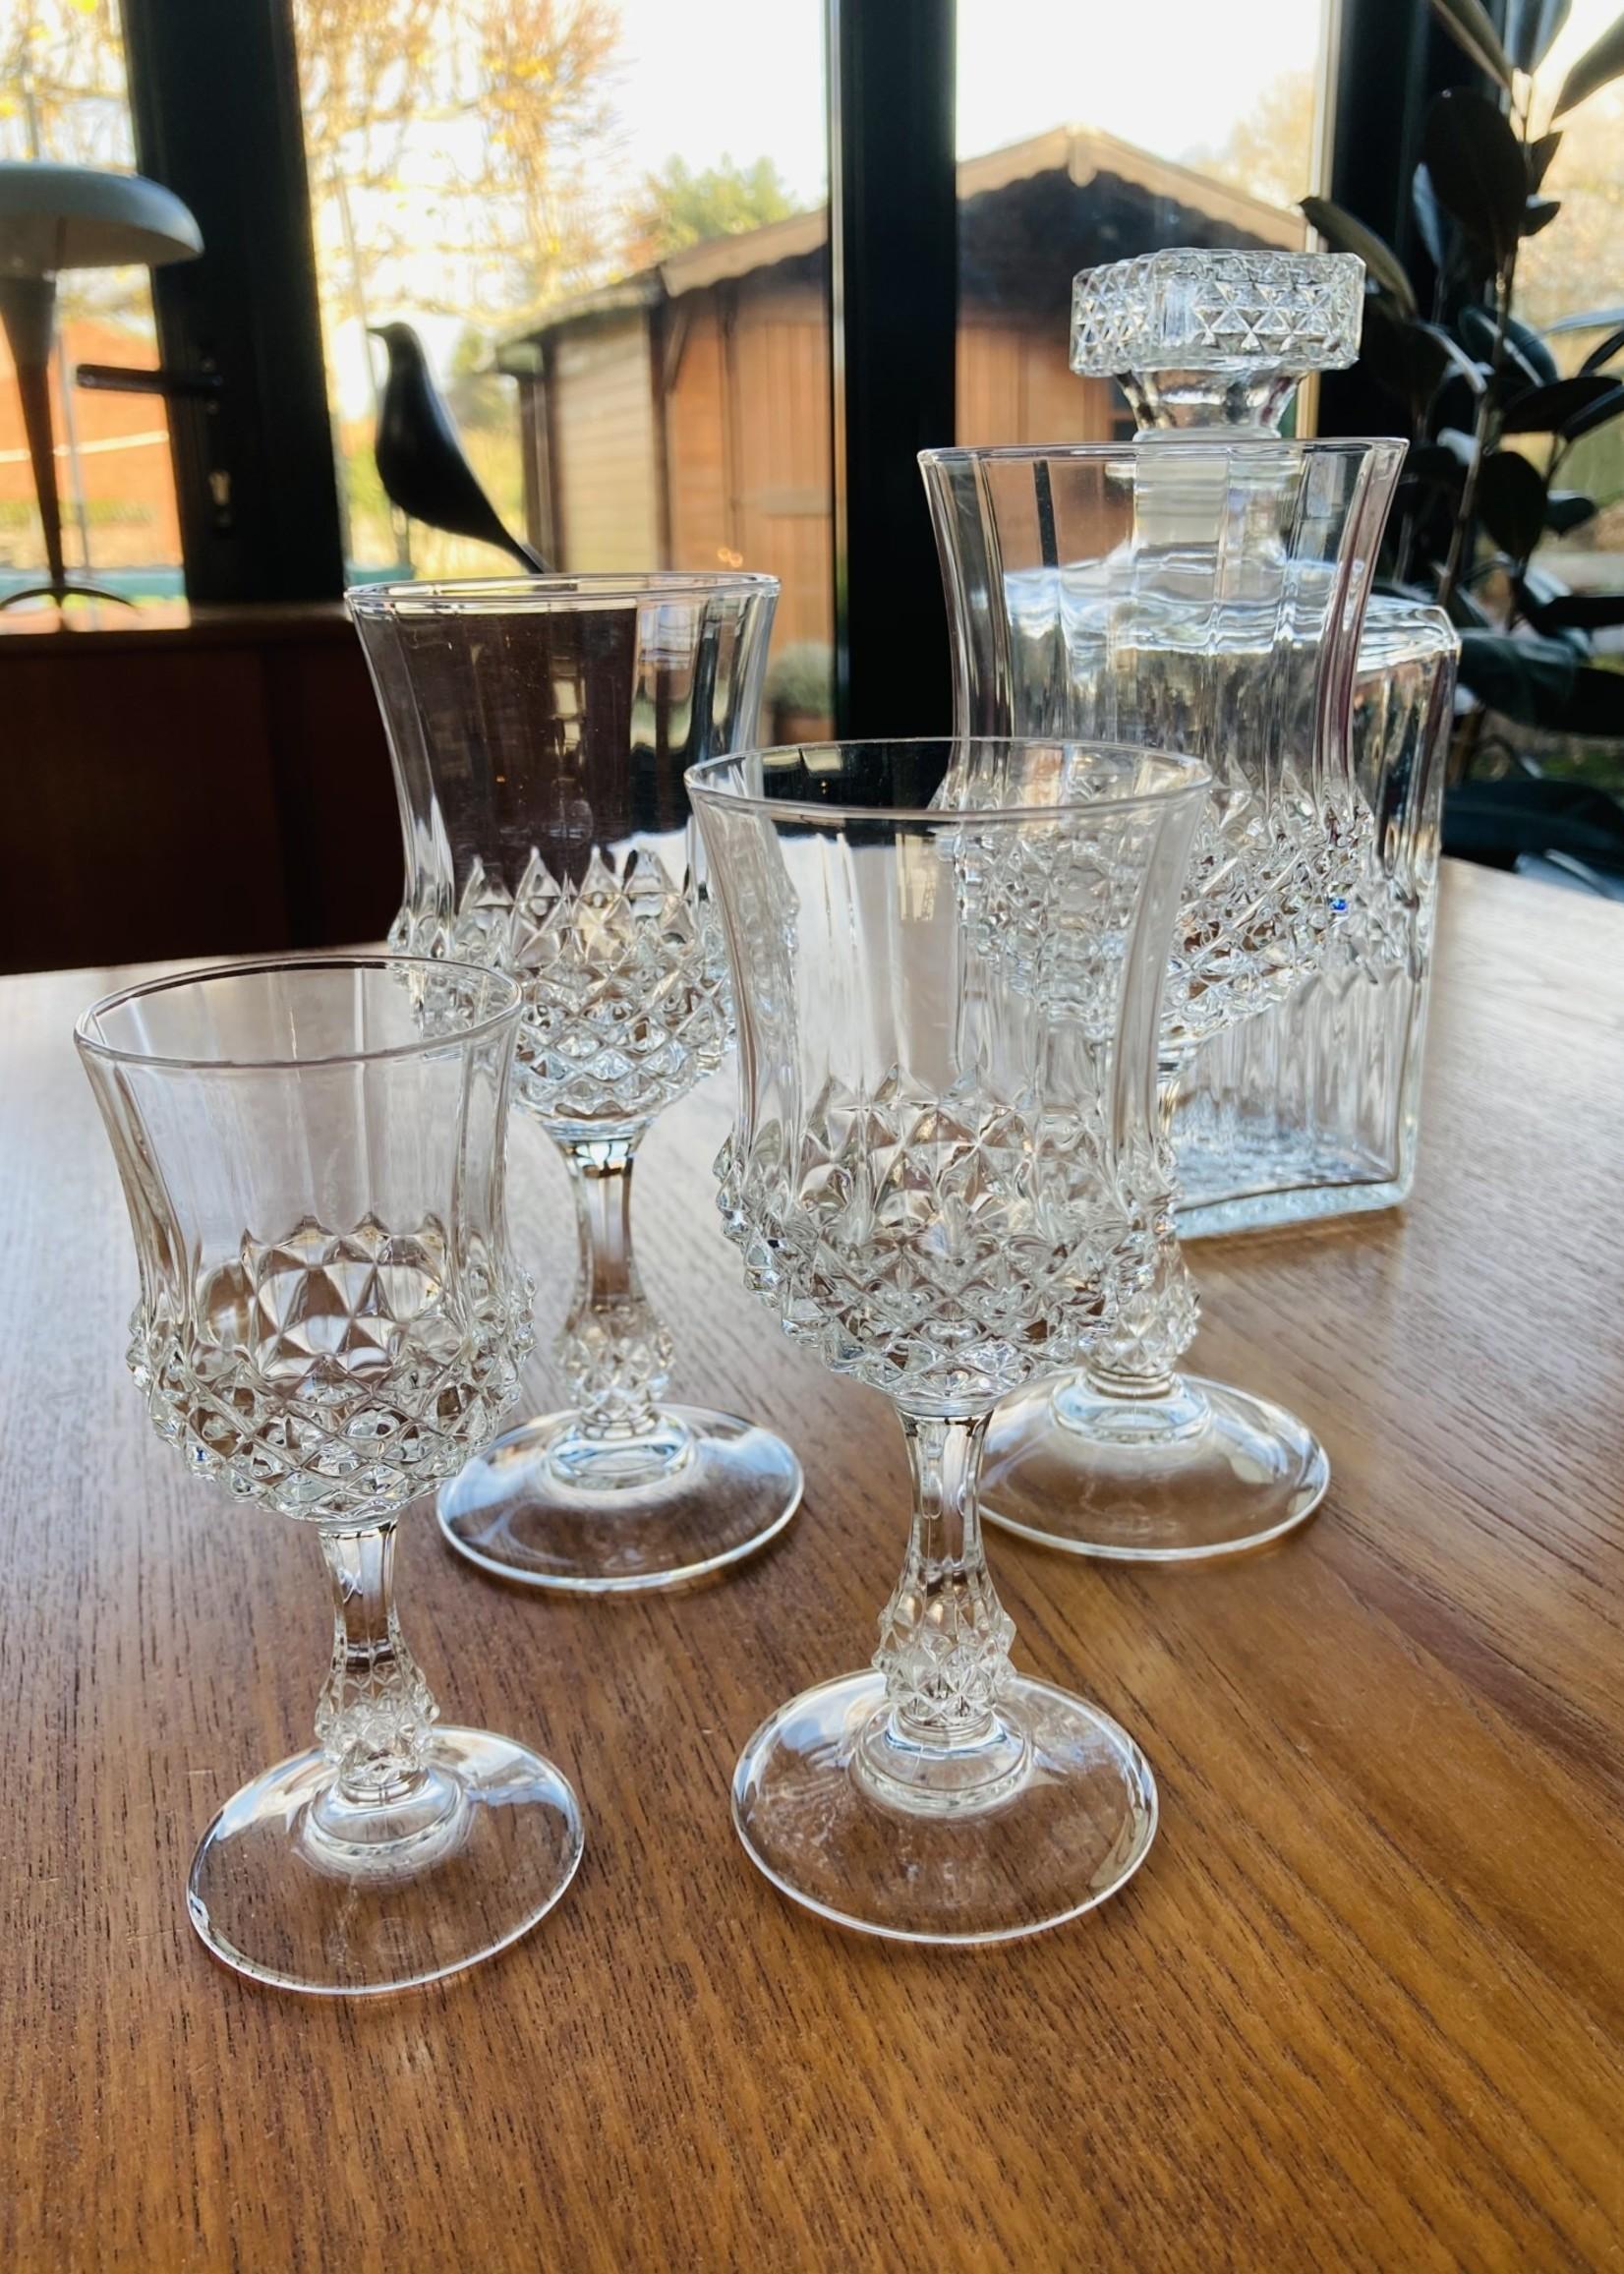 Crystal glasses - 6 Port glasses